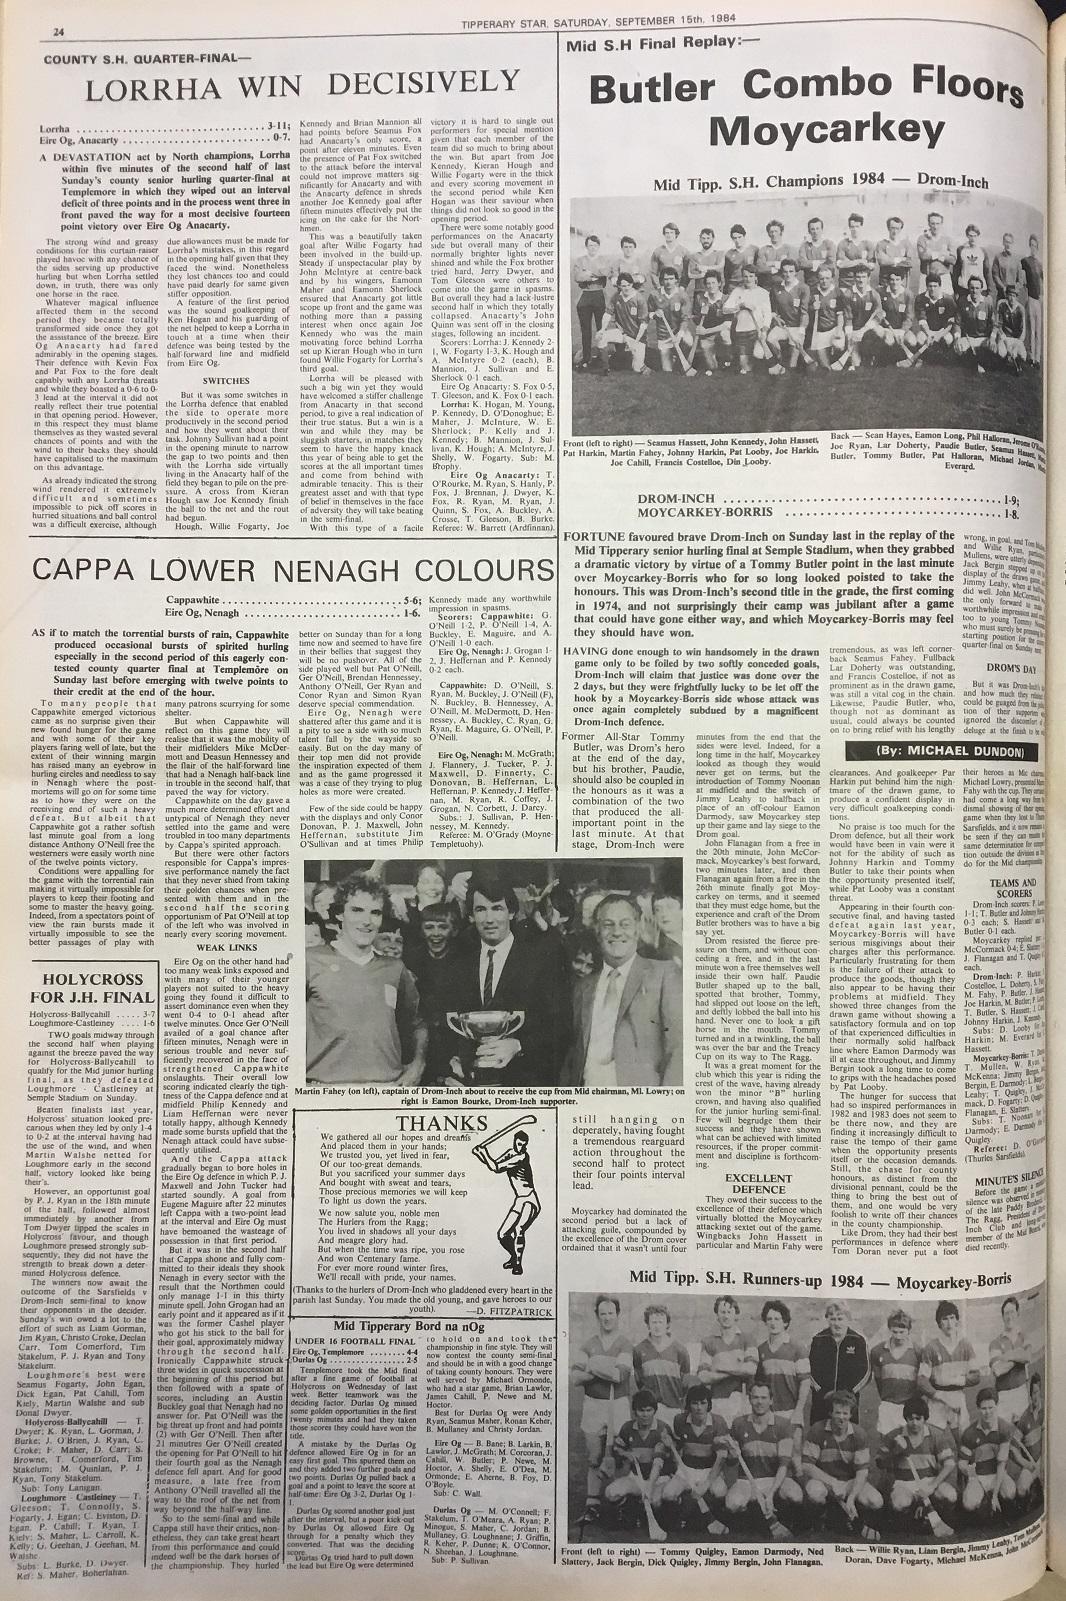 1984 Mid hurling final replay